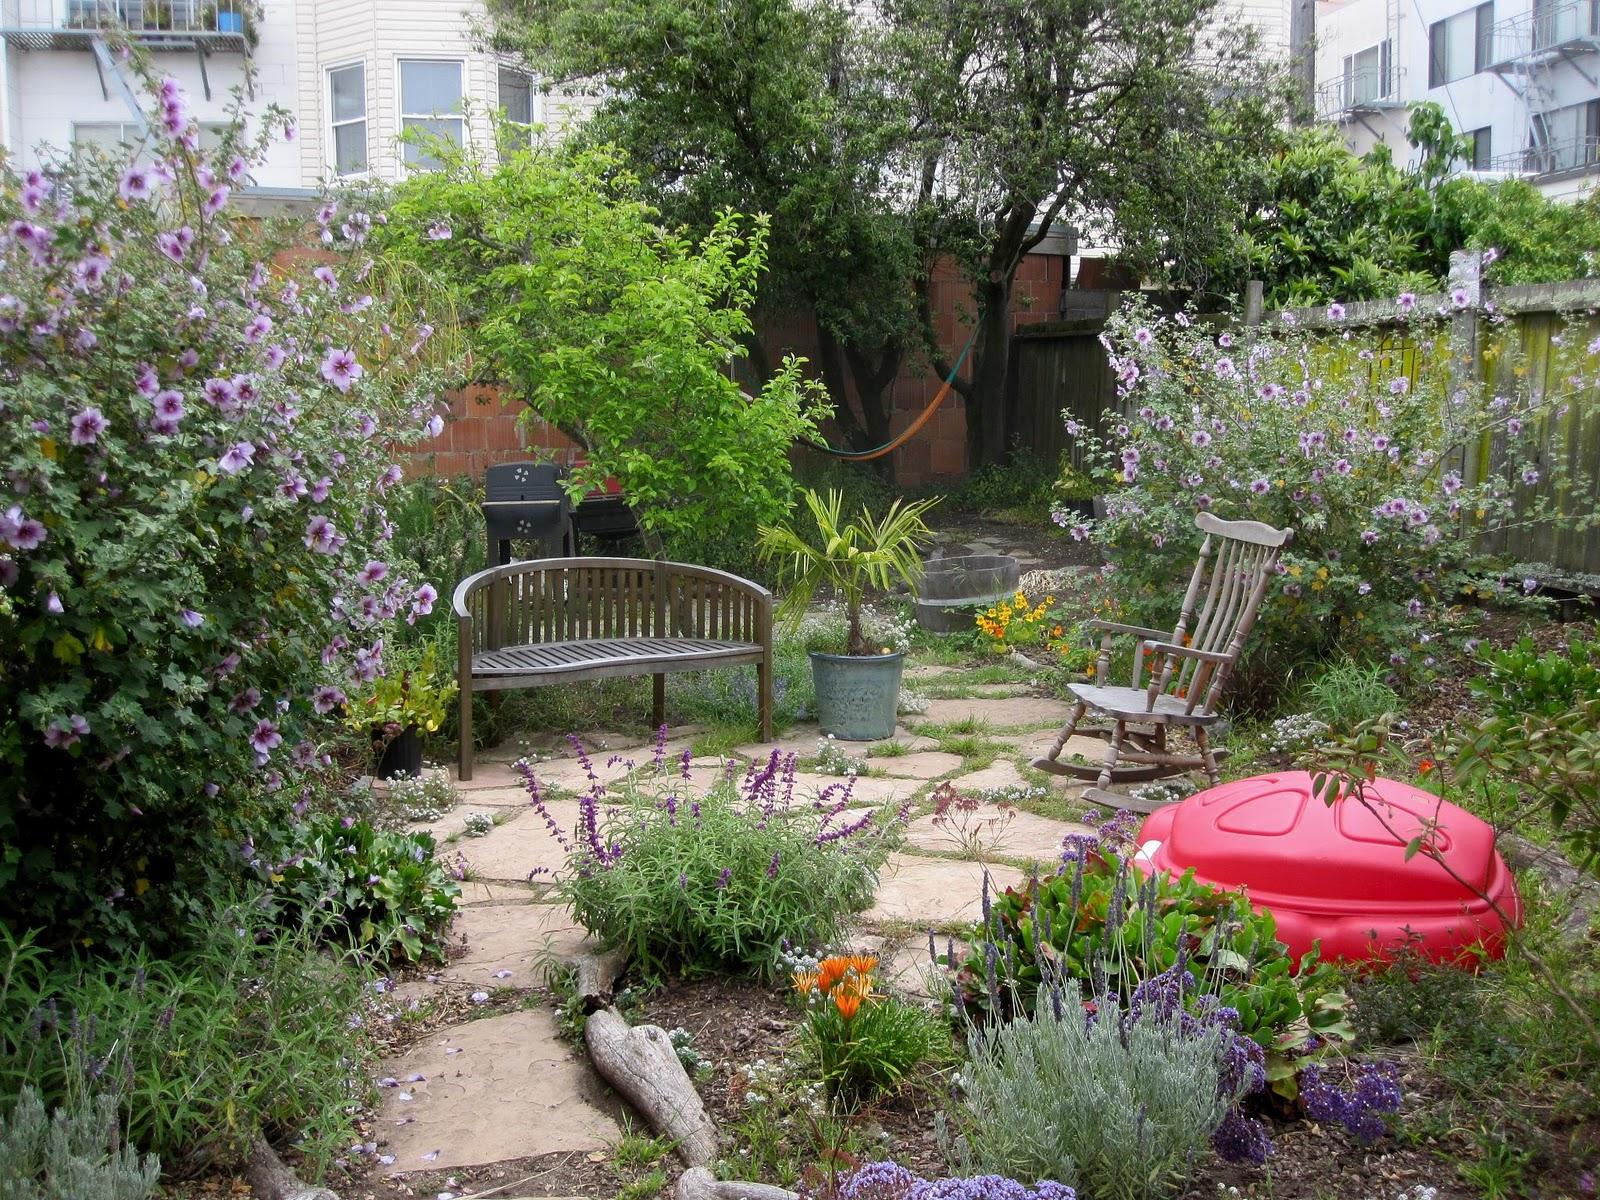 Vegetable garden ideas besides beautiful small garden ideas on plans - Lawn Garden Inspiring Rooftop Garden Ideas